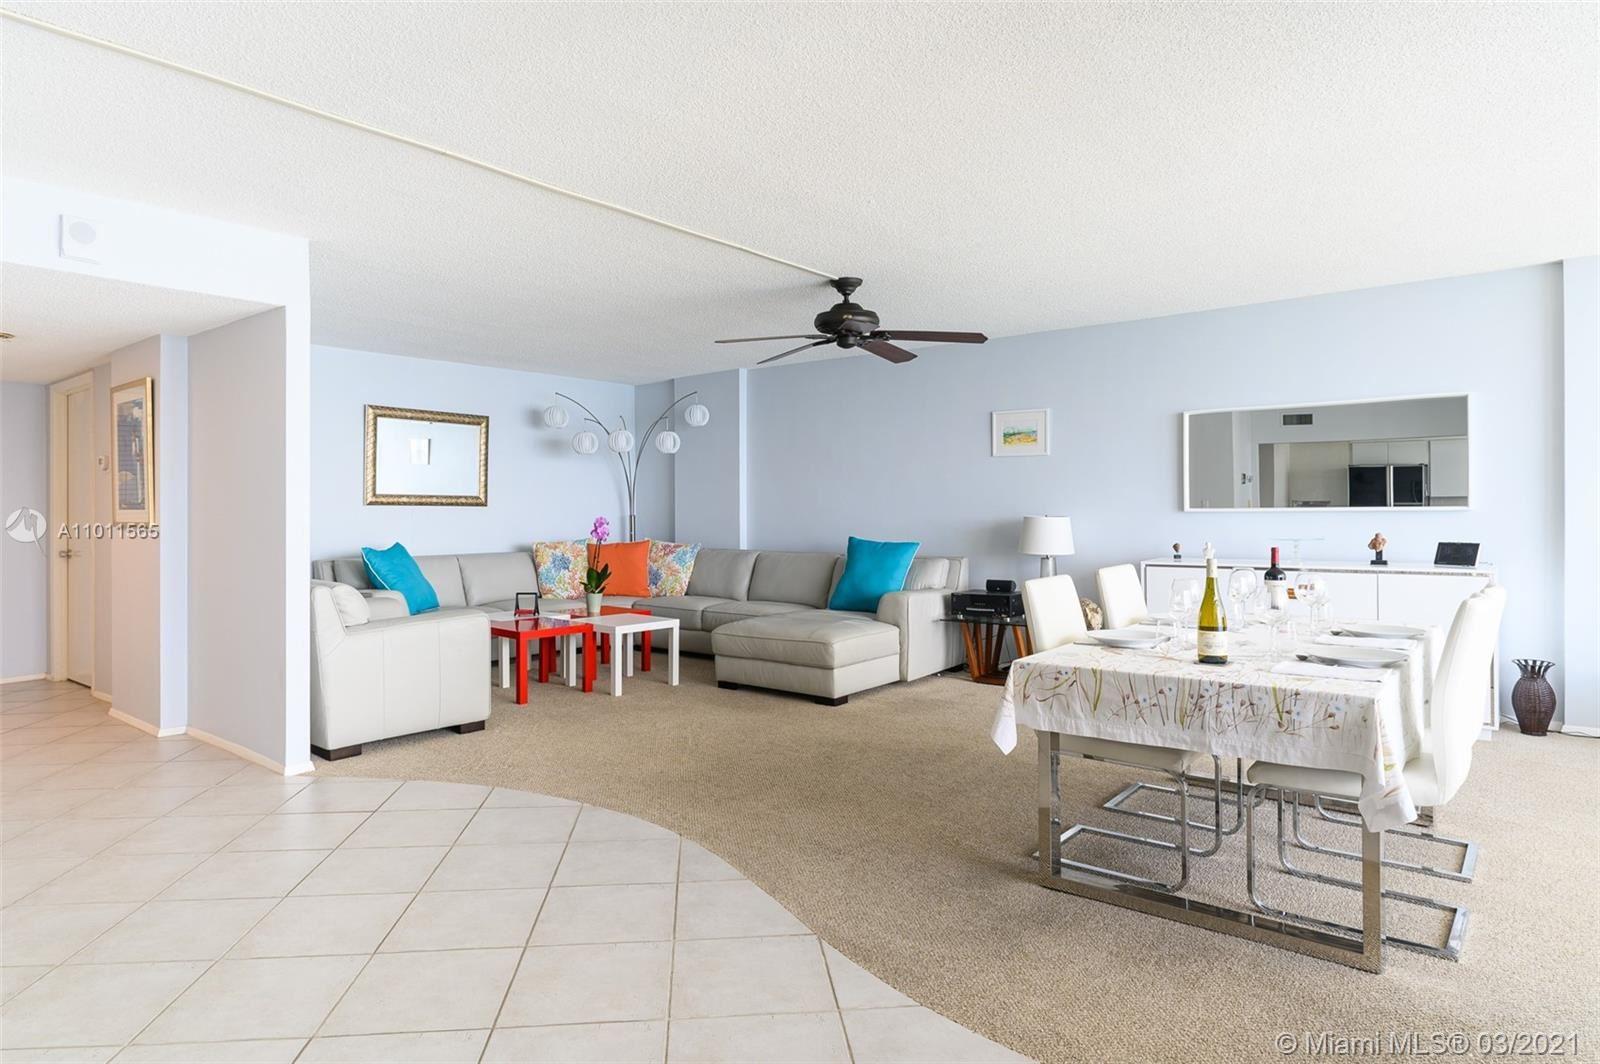 4300 N Ocean Blvd #20F, Fort Lauderdale, FL 33308 - #: A11011565